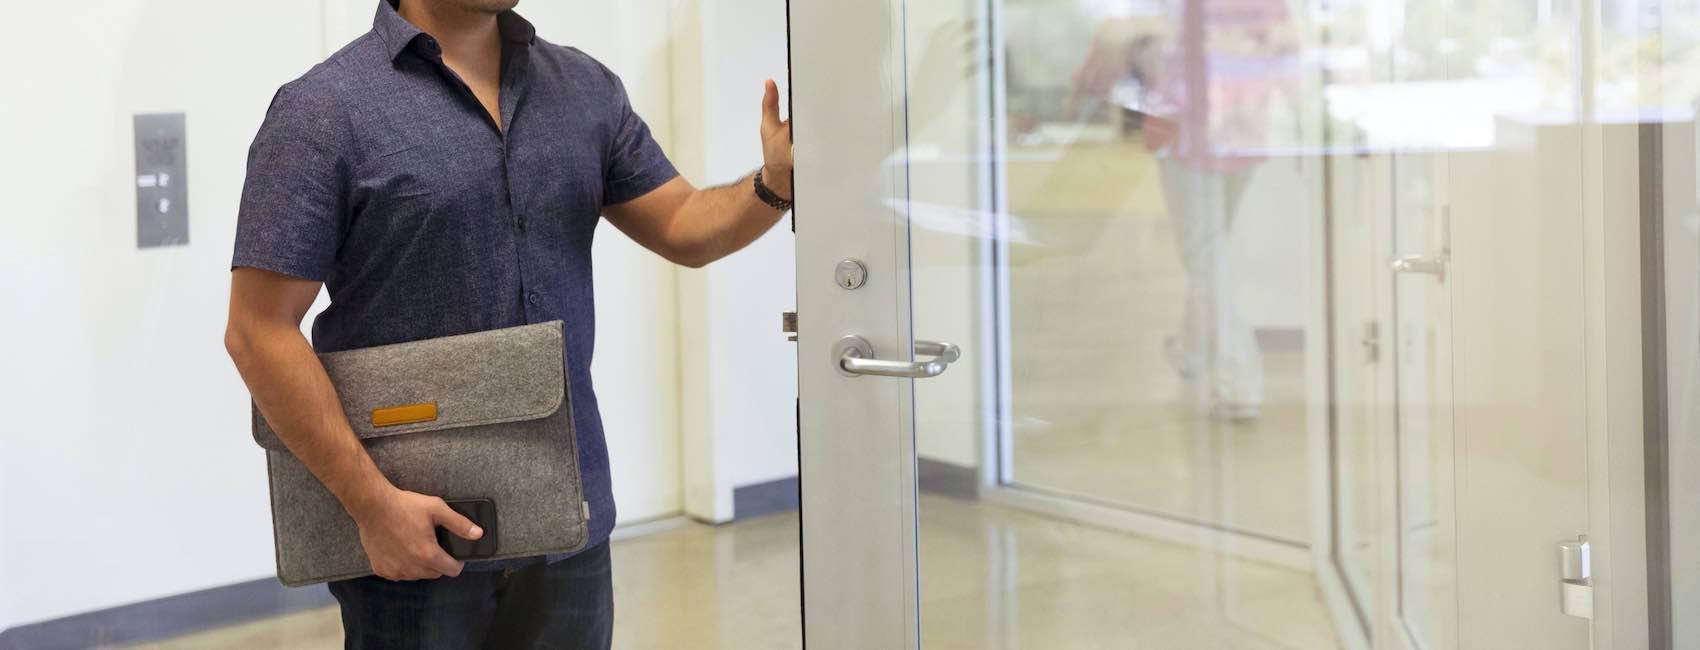 Man walking out office door